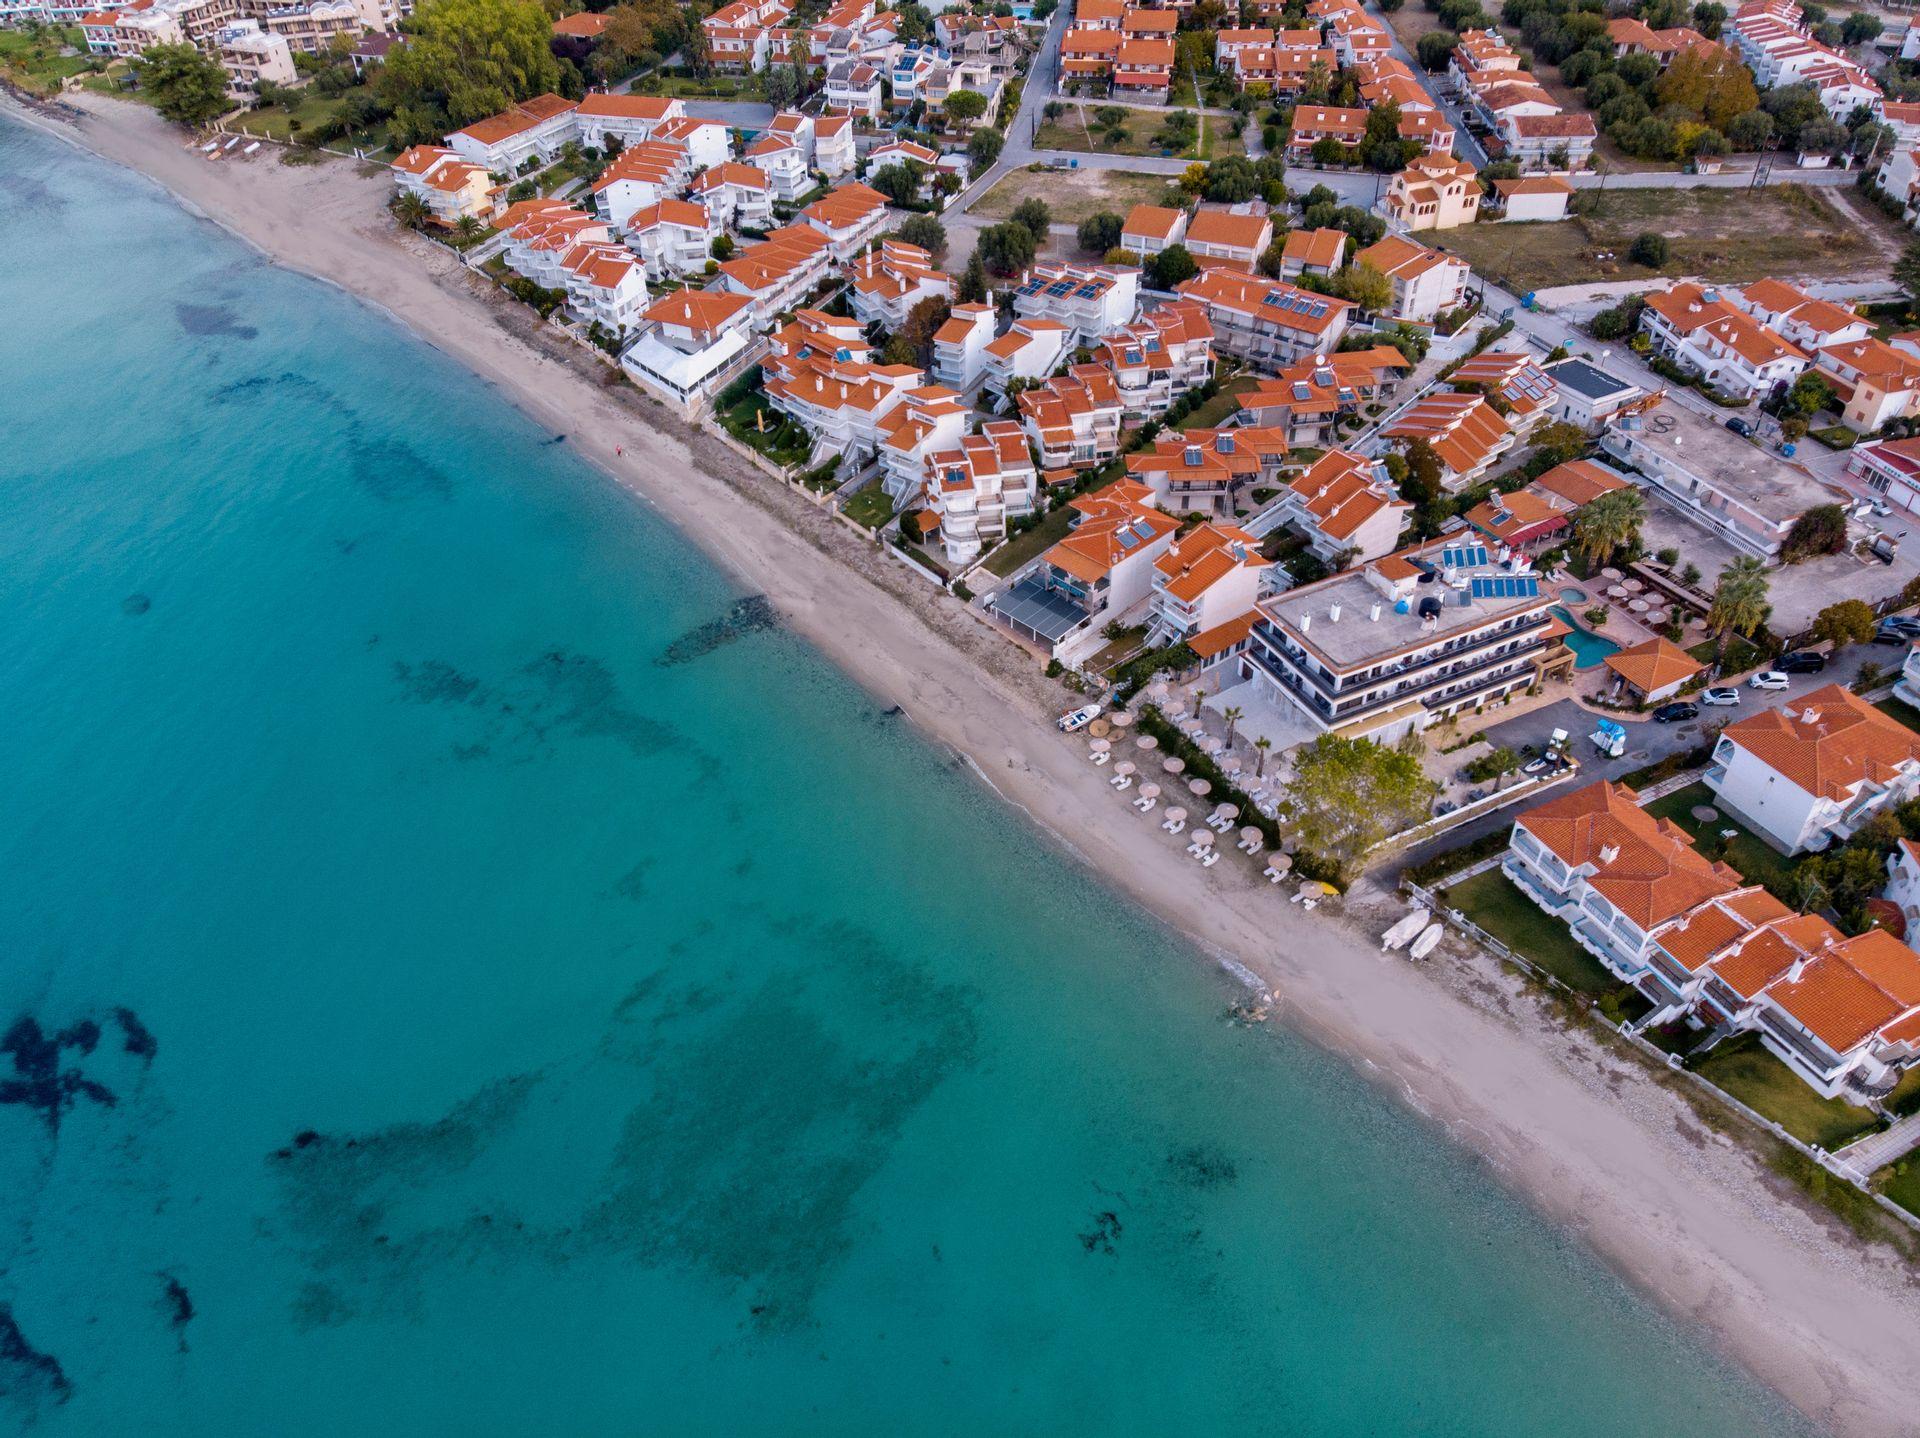 4* Greek Pride Seafront Hotel - Παραλία Φούρκας, Χαλκιδική